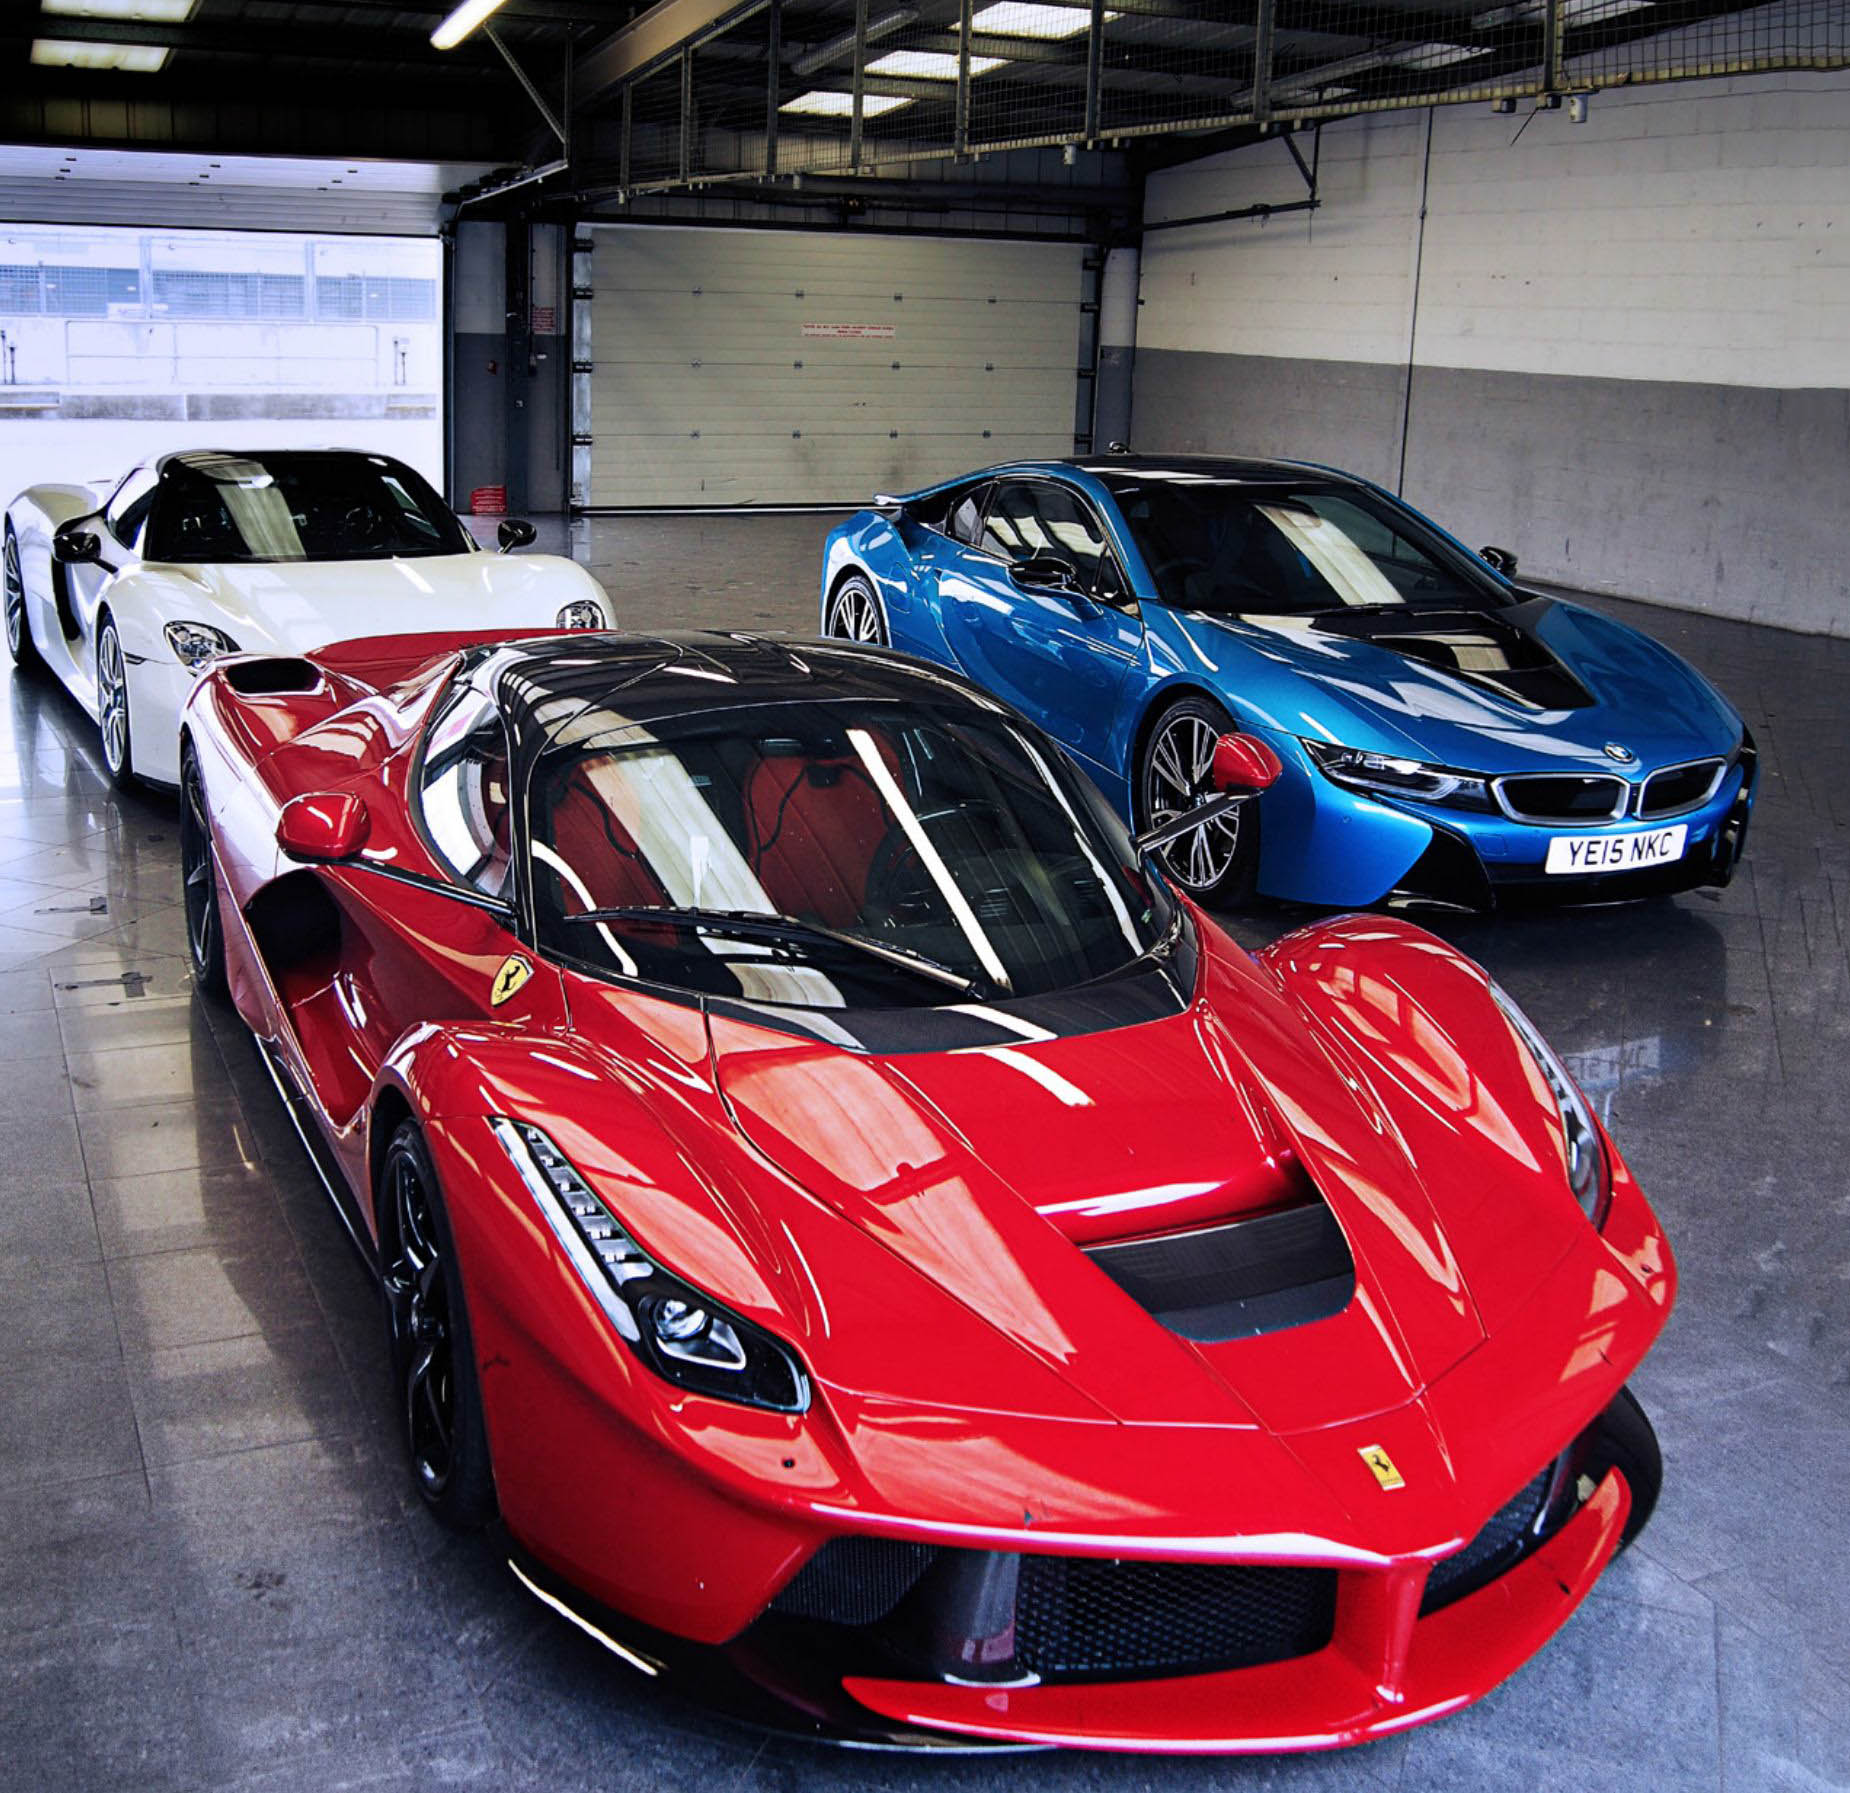 2016 Ferrari LaFerrari vs. 2016 Porsche 918 Spyder and 2016 McLaren on mclaren p1 vs ferrari laferrari, ferrari 458 vs ferrari laferrari, pagani huayra vs ferrari laferrari, lamborghini aventador vs ferrari laferrari,